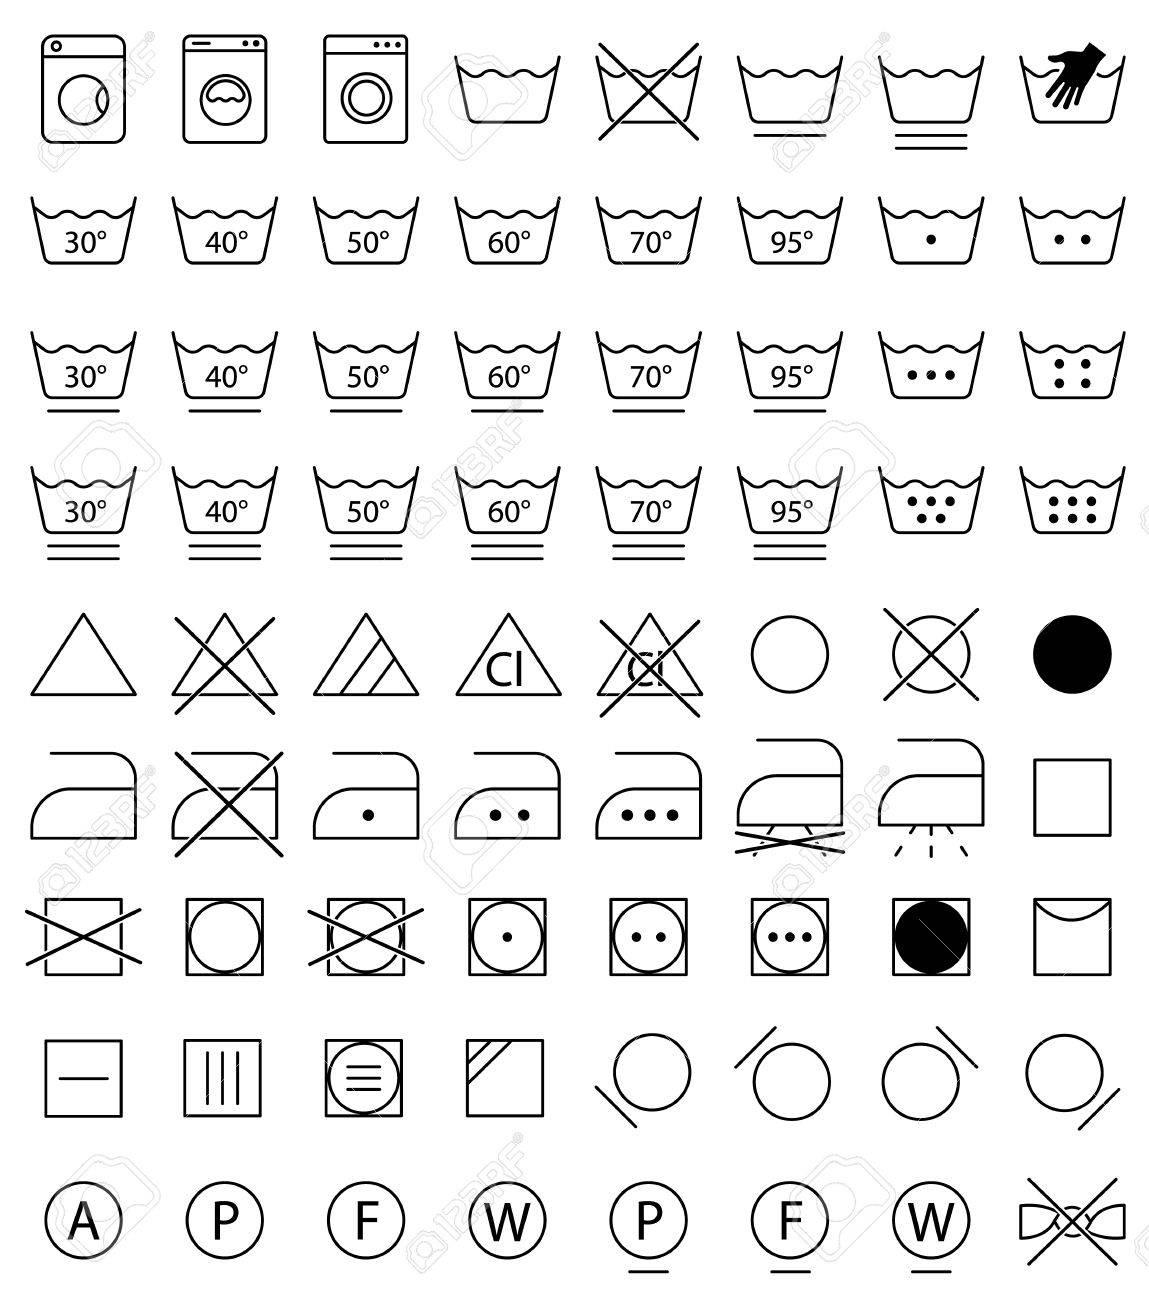 Laundry icons washing symbols royalty free cliparts vectors and laundry icons washing symbols stock vector 75982951 biocorpaavc Images